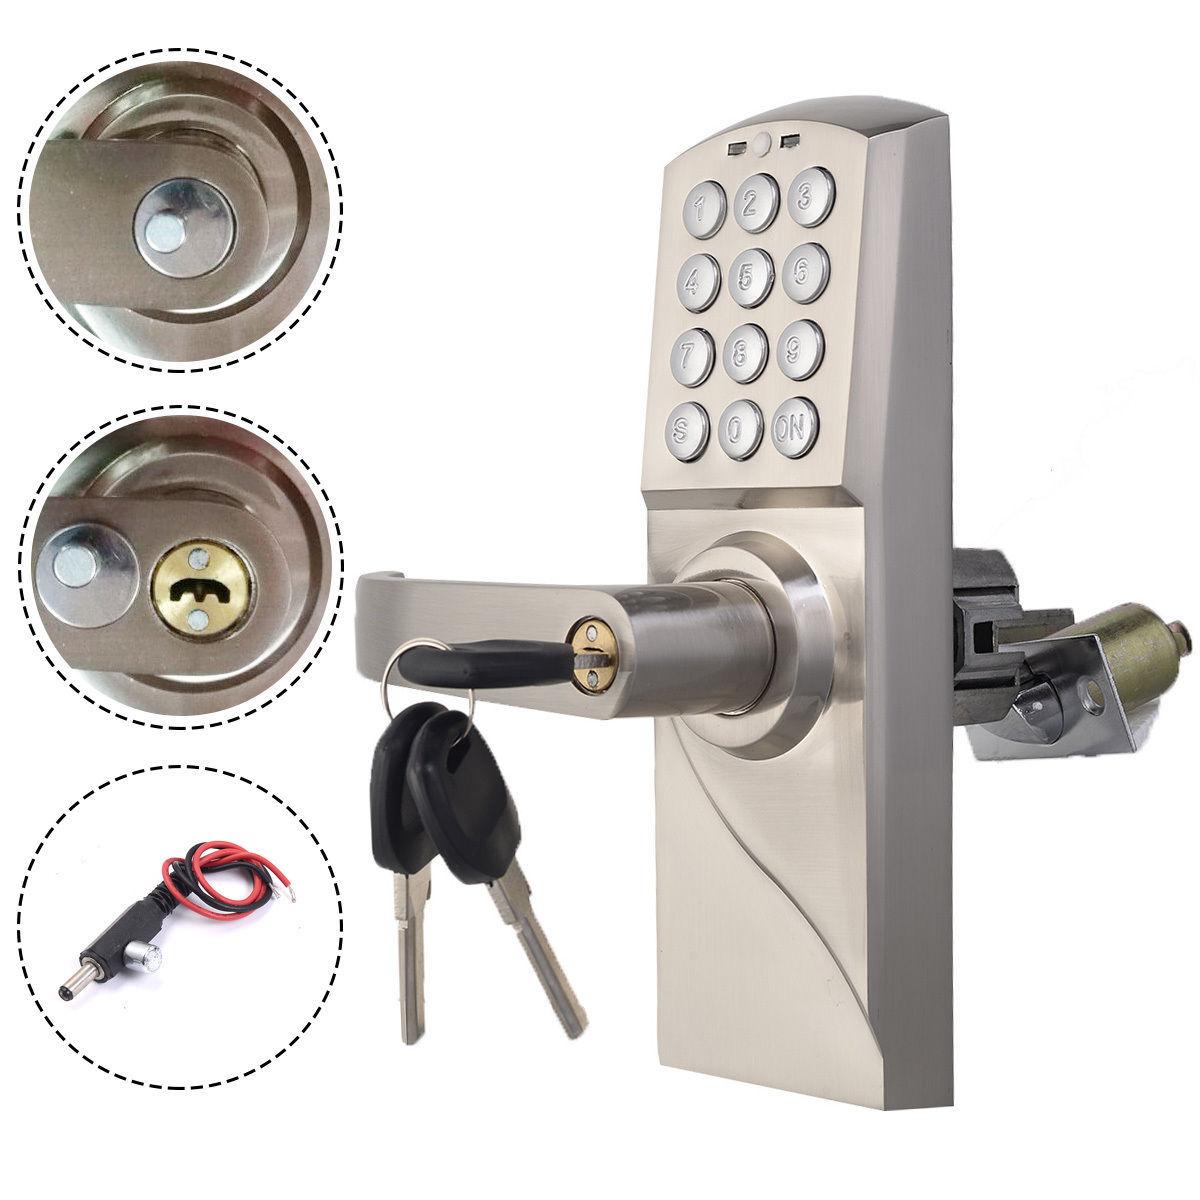 Keypad Lock For Sale Only 2 Left At 75